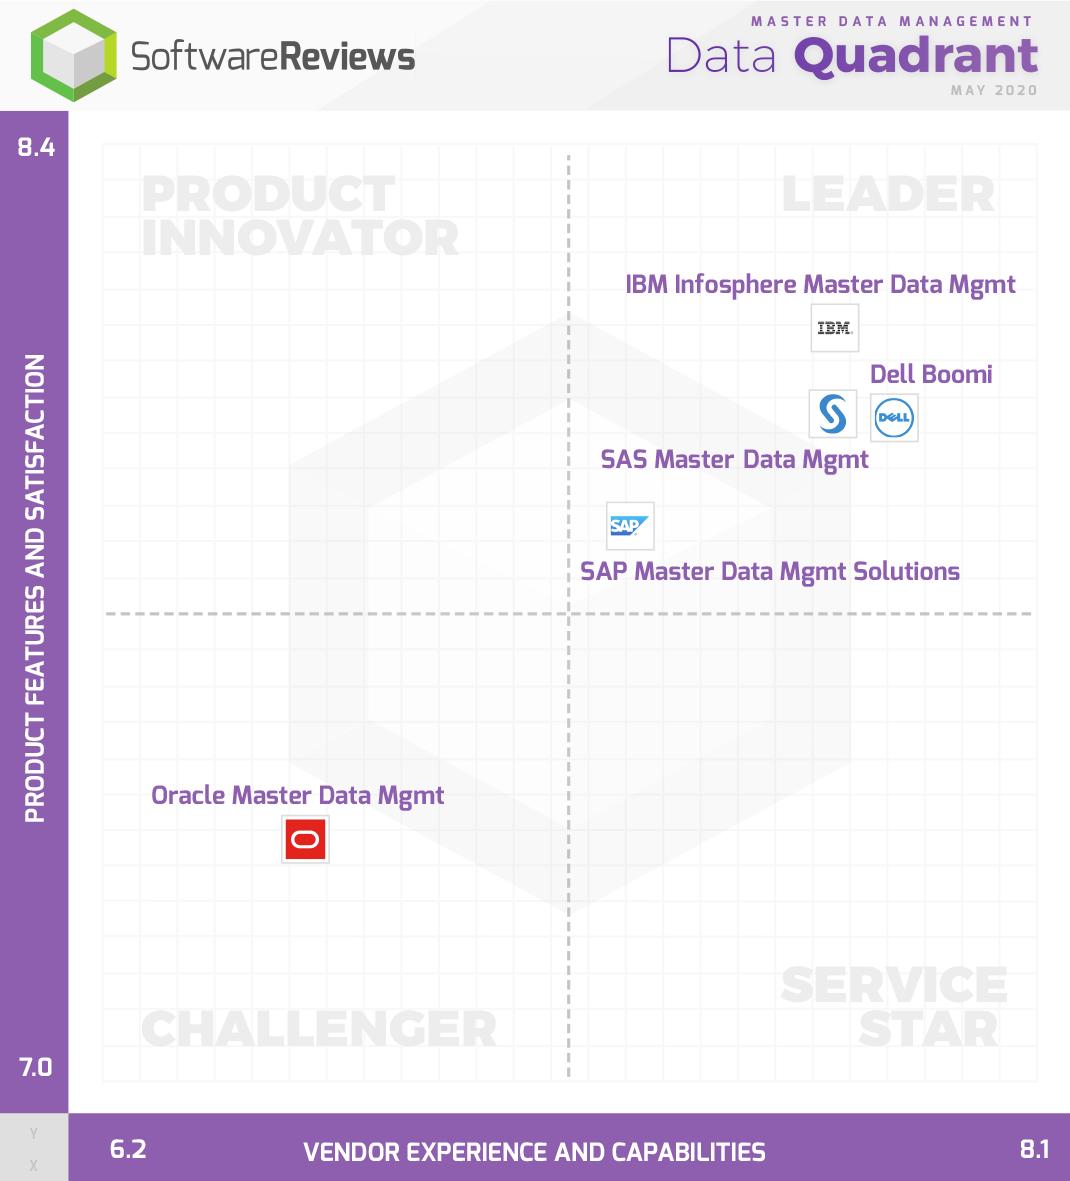 Master Data Management Data Quadrant